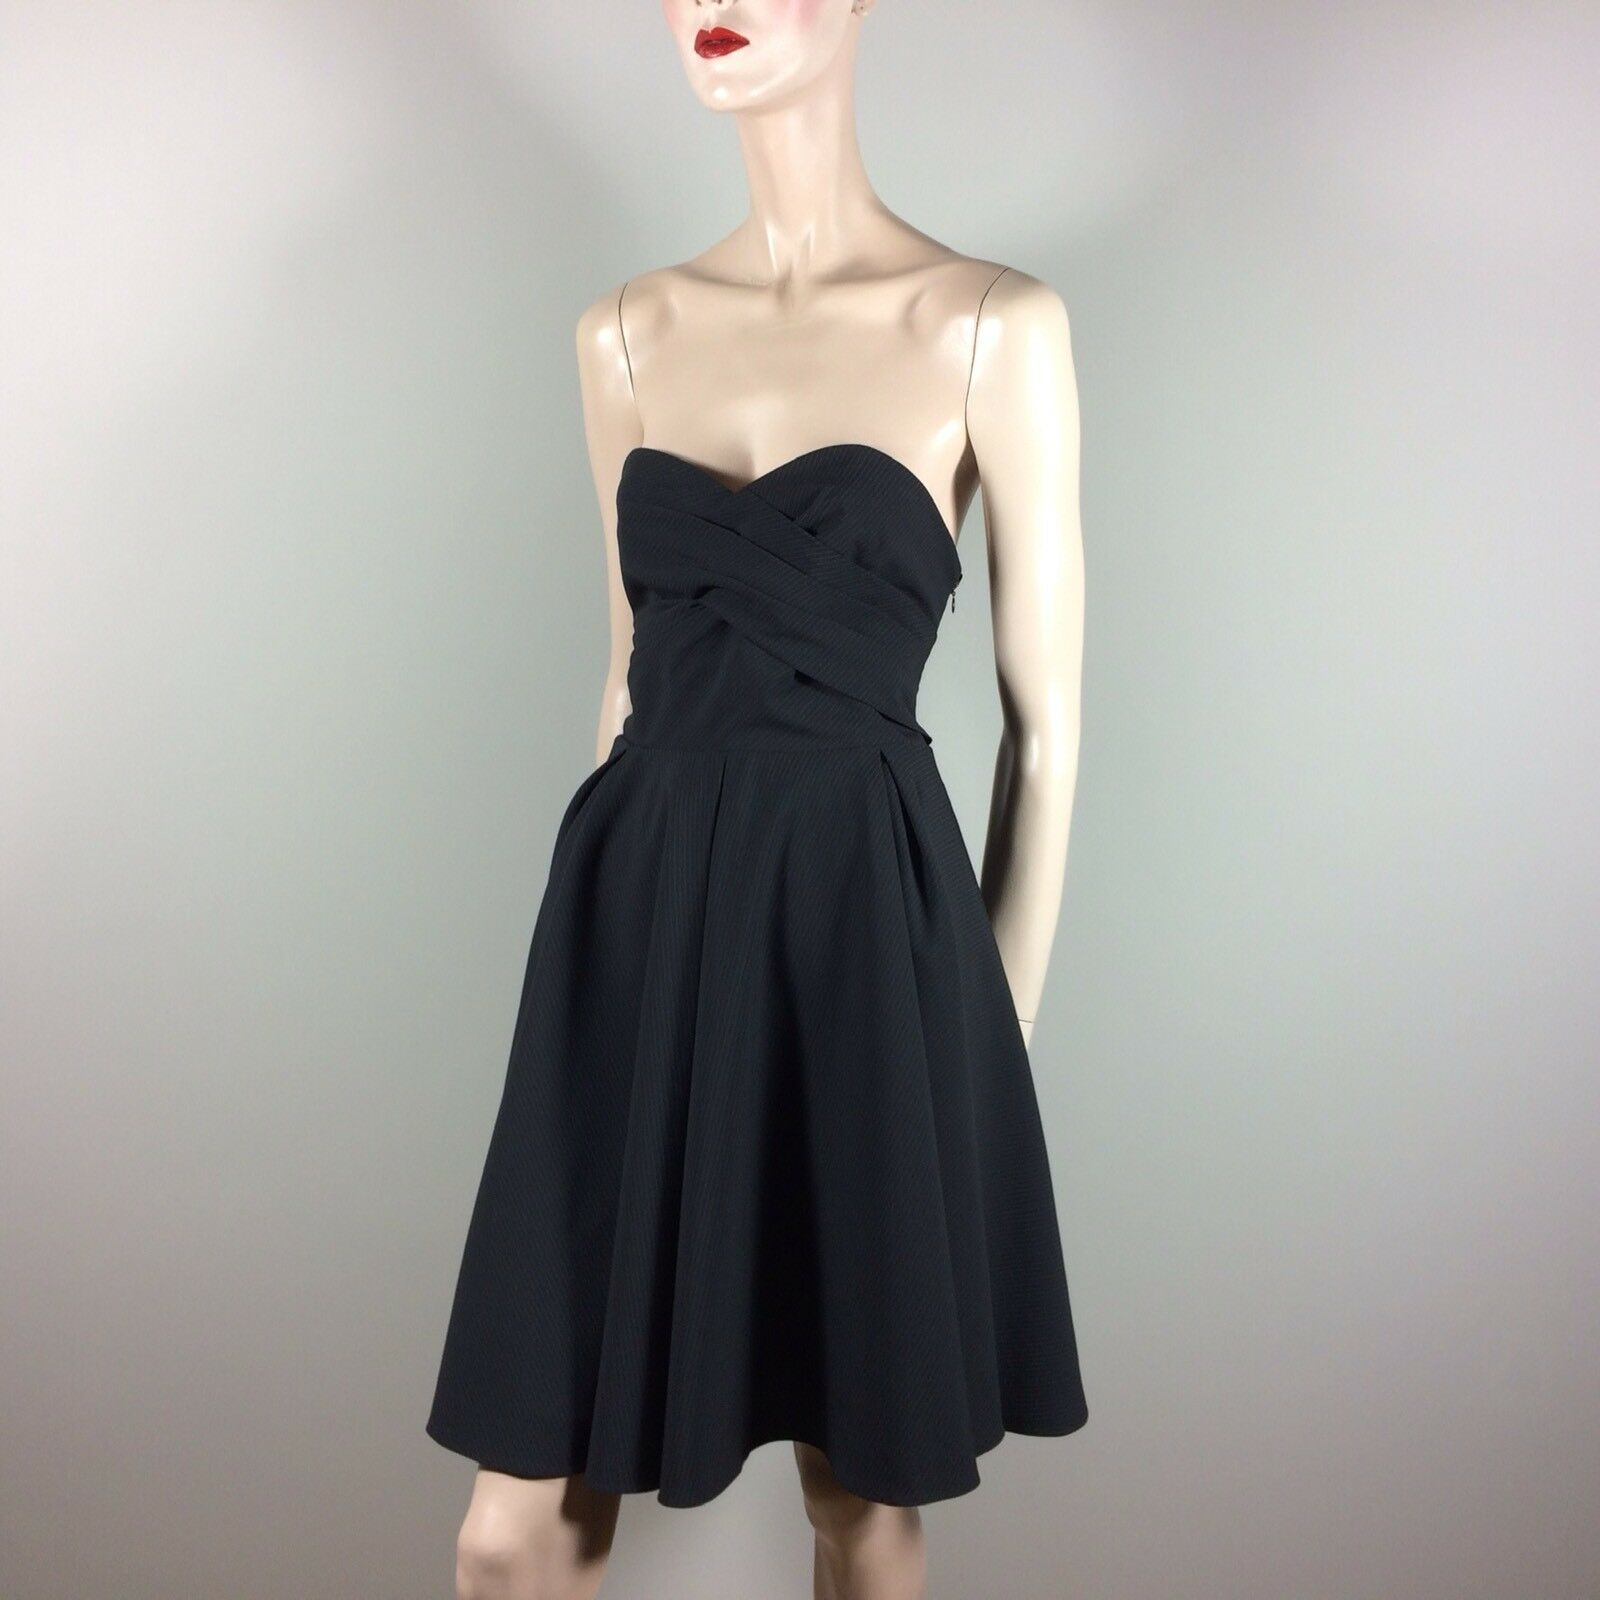 PAUL & JOE SISTER Damen Kleid L 40 Schwarz Designer Couture Vintage Look Flare